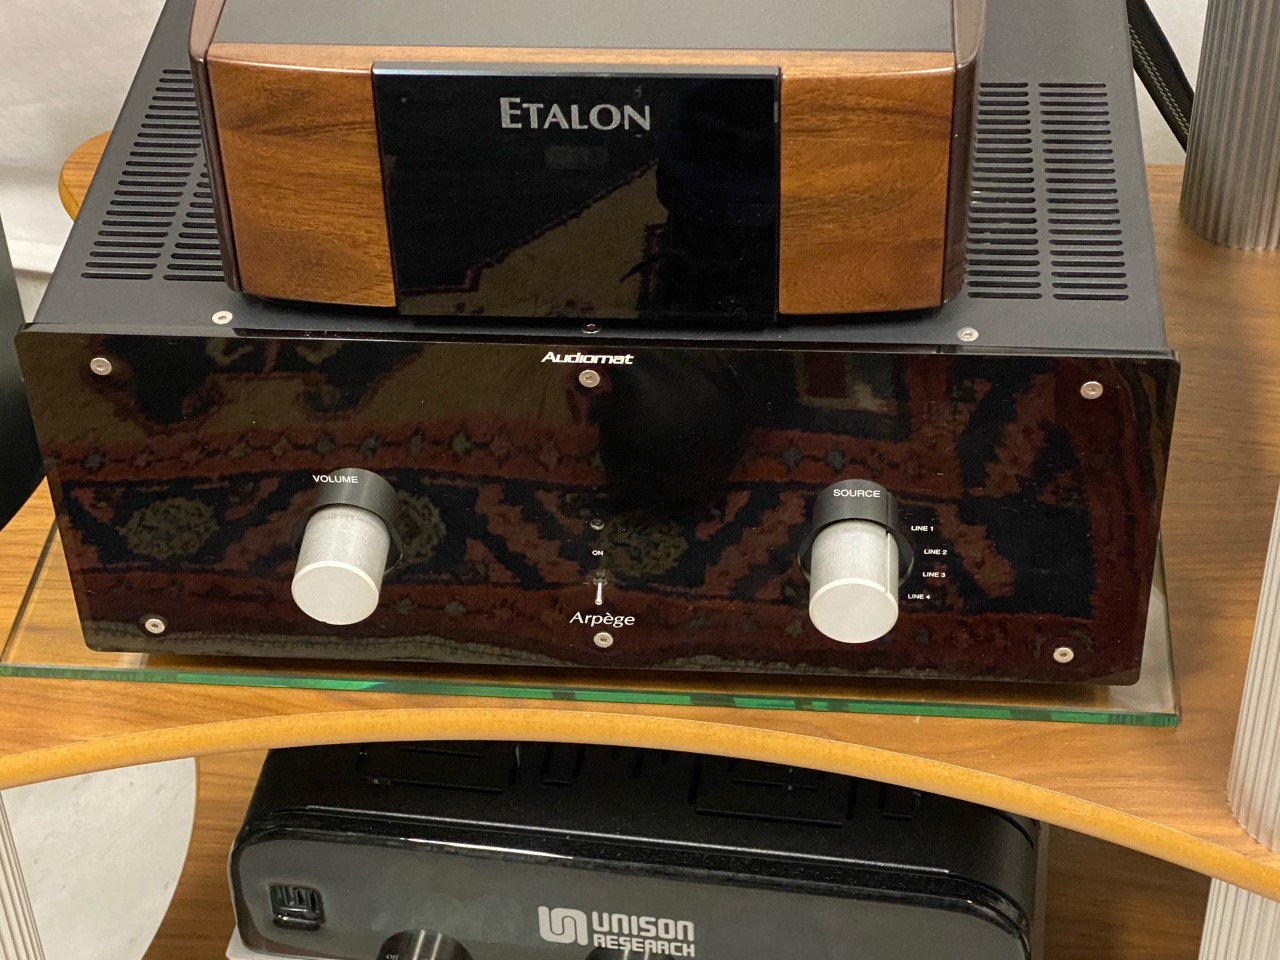 Audiomat Arpege tube amplifier OCCASION